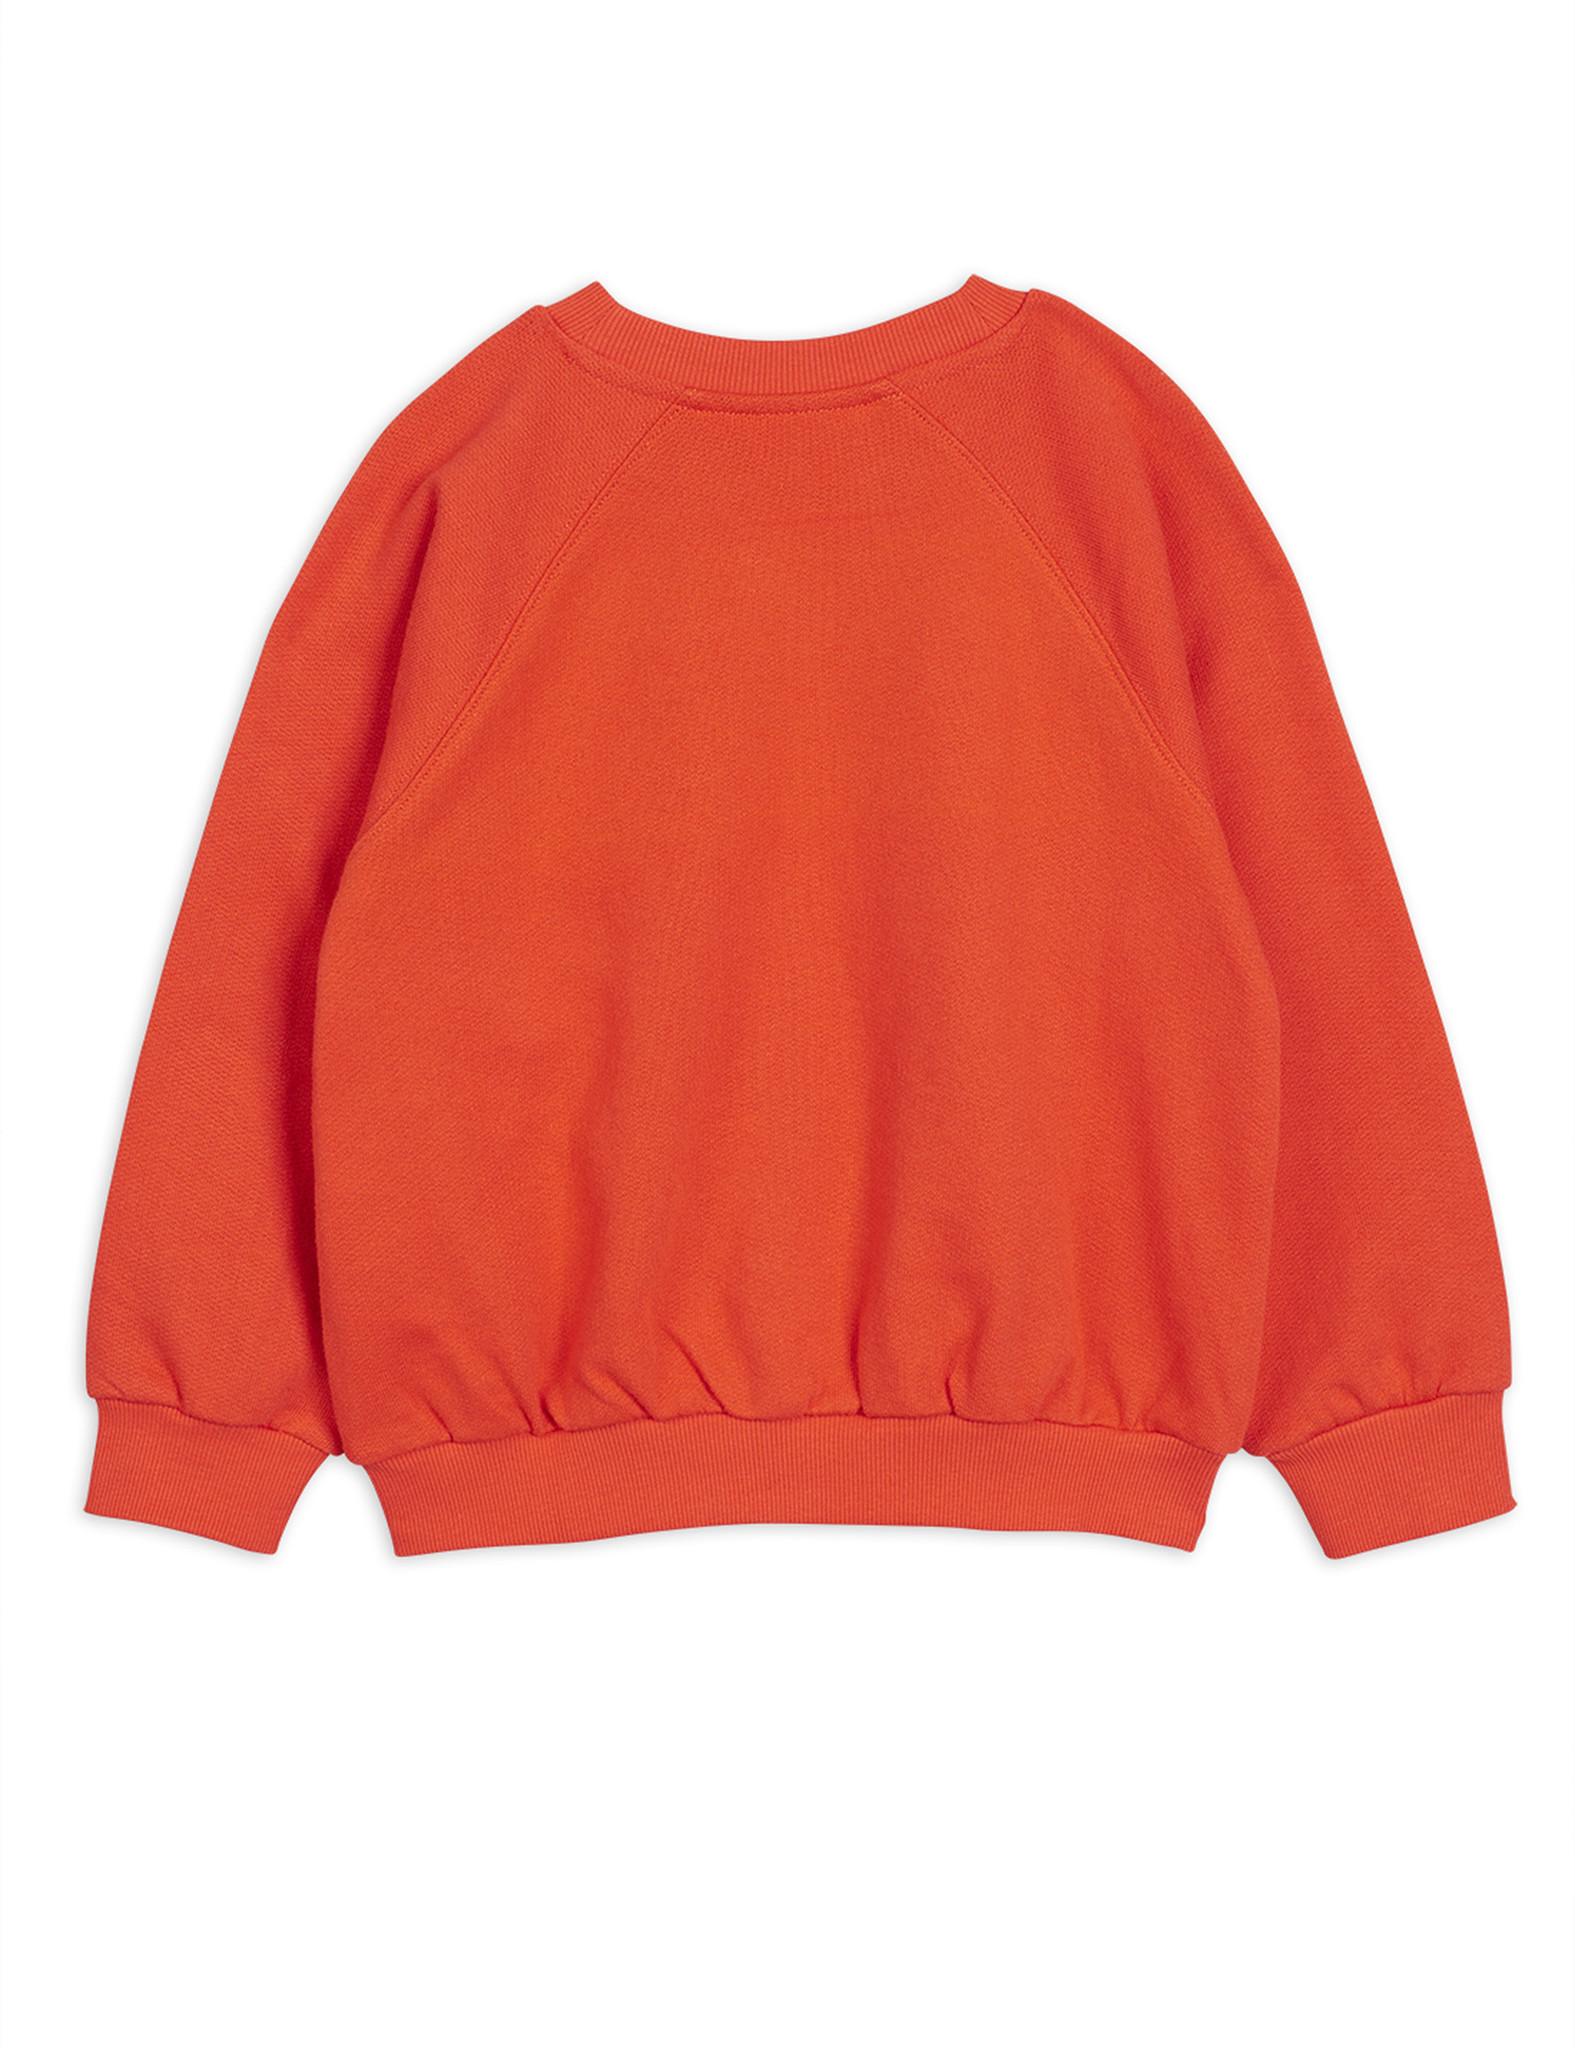 Tennis anyone sp sweatshirt - Red-3